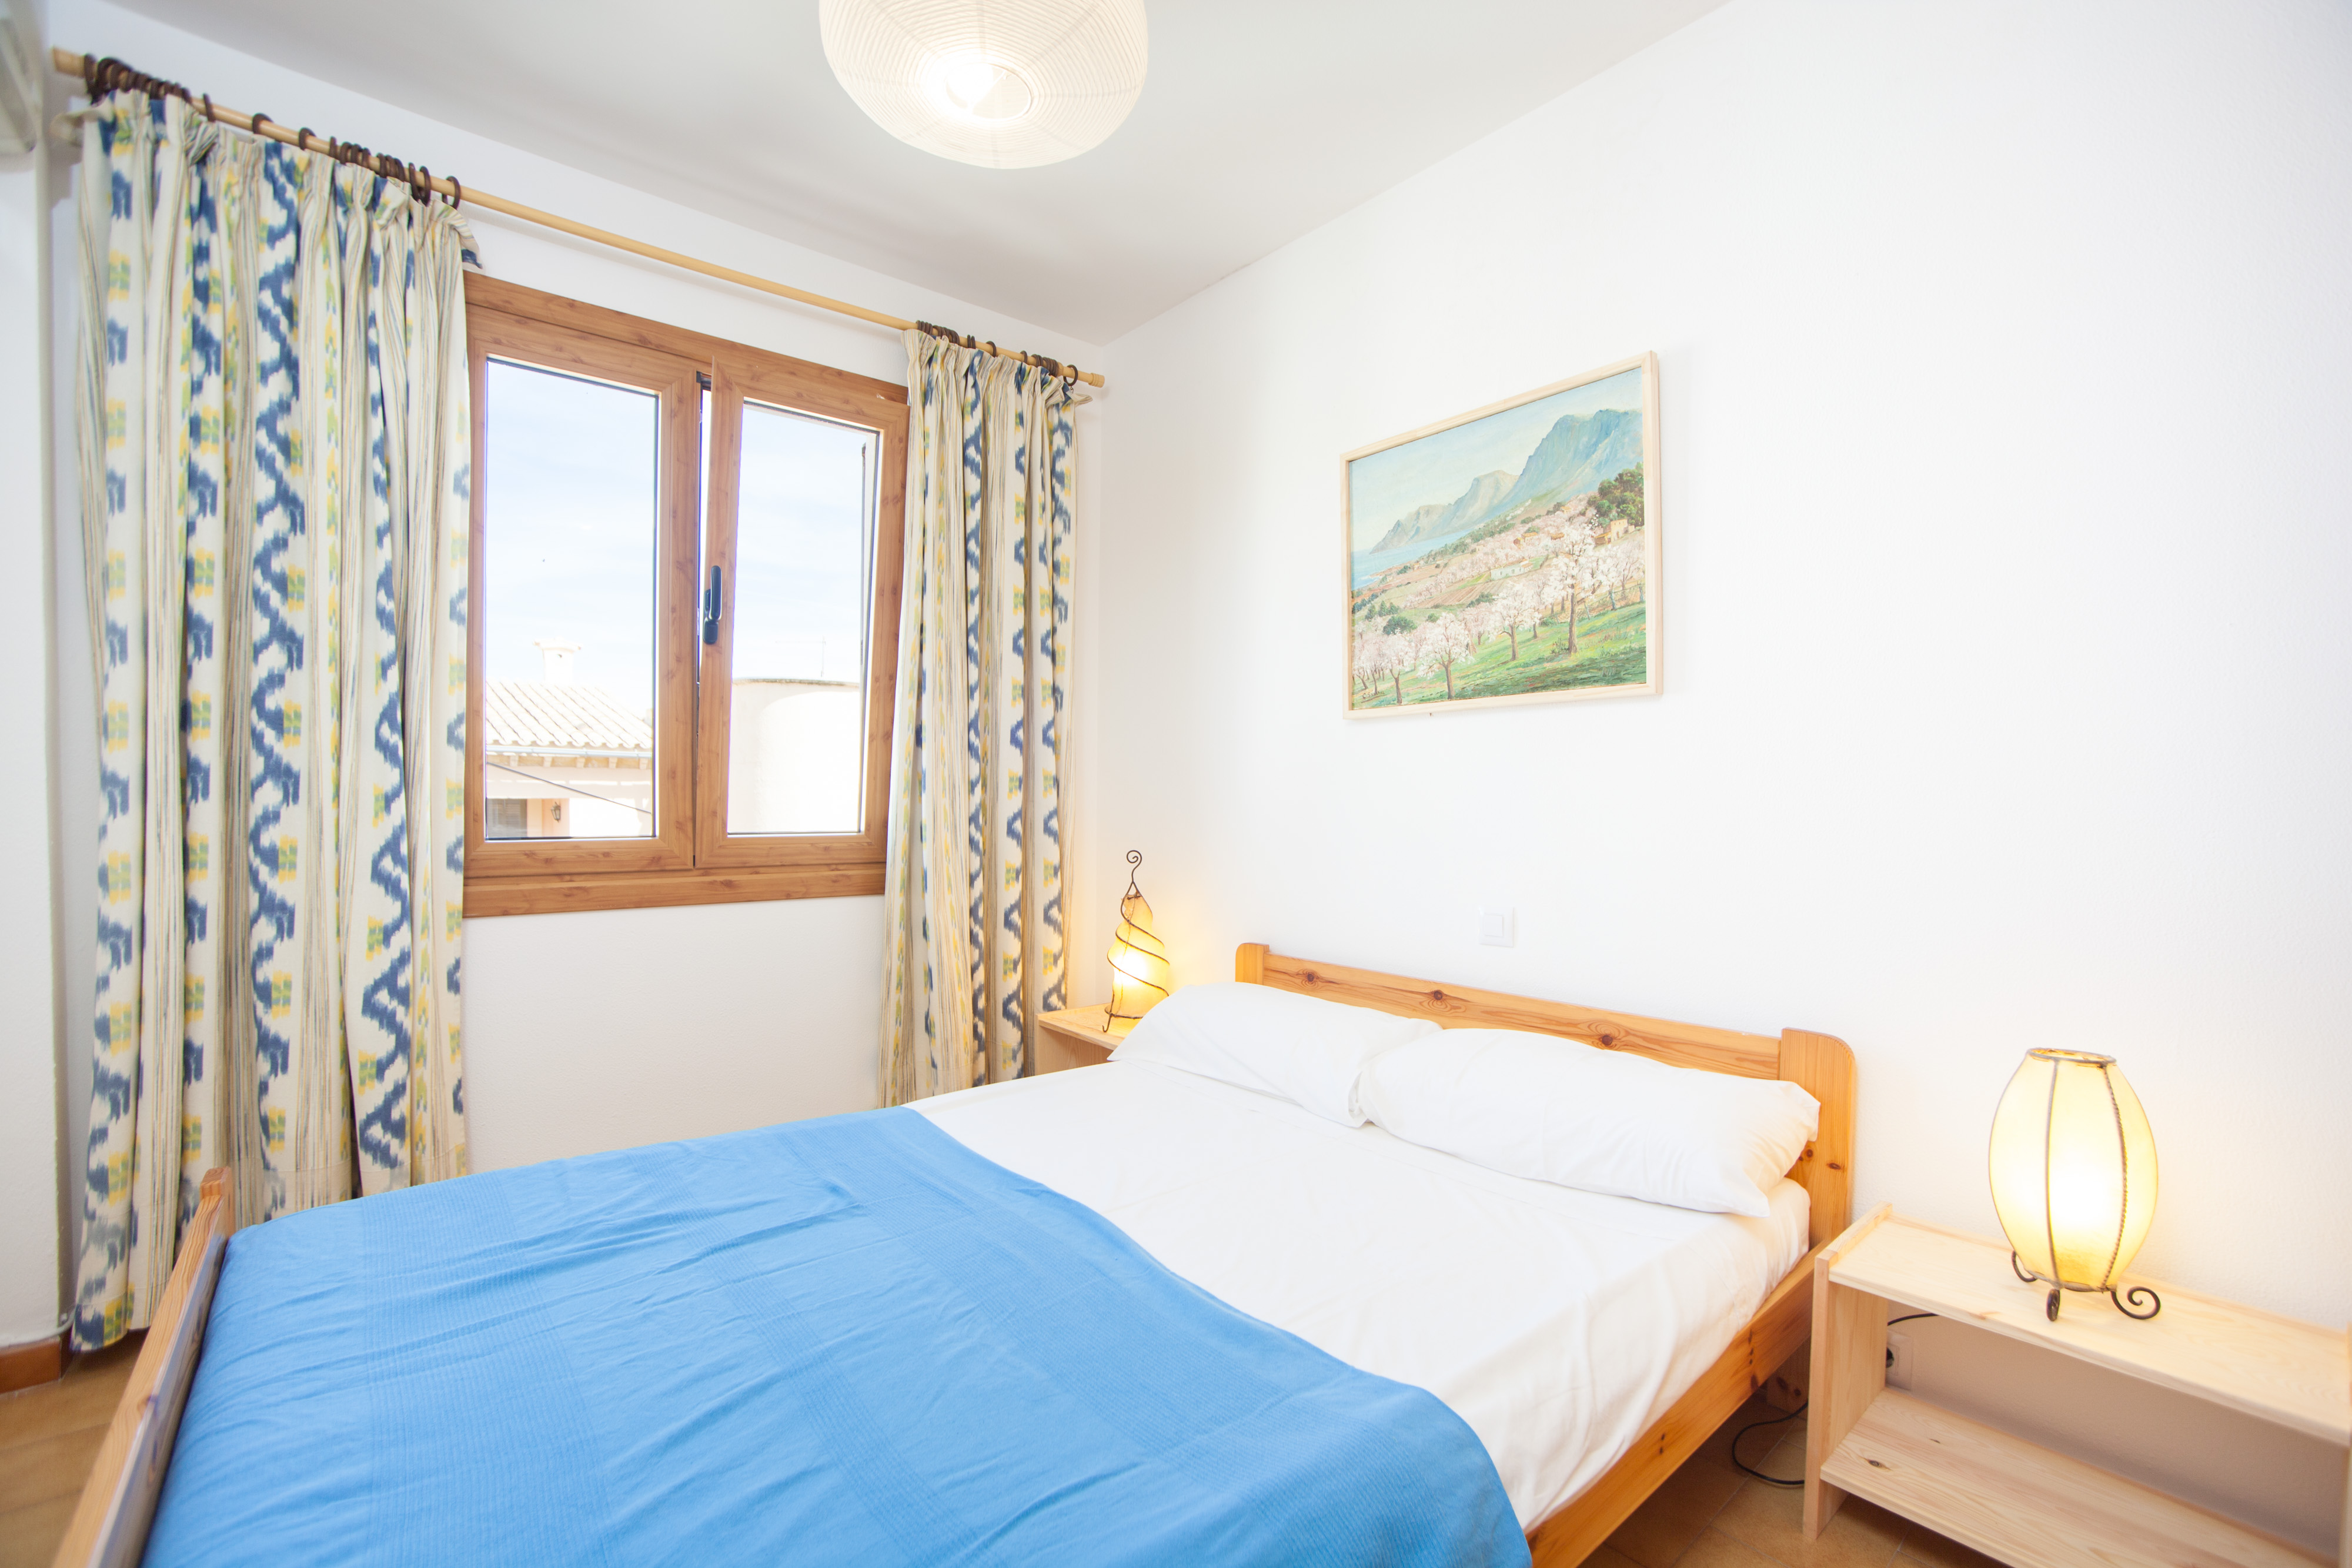 Ferienhaus CAN CUSSÓ SANSÓ (2198042), Colonia de Sant Pere, Mallorca, Balearische Inseln, Spanien, Bild 15